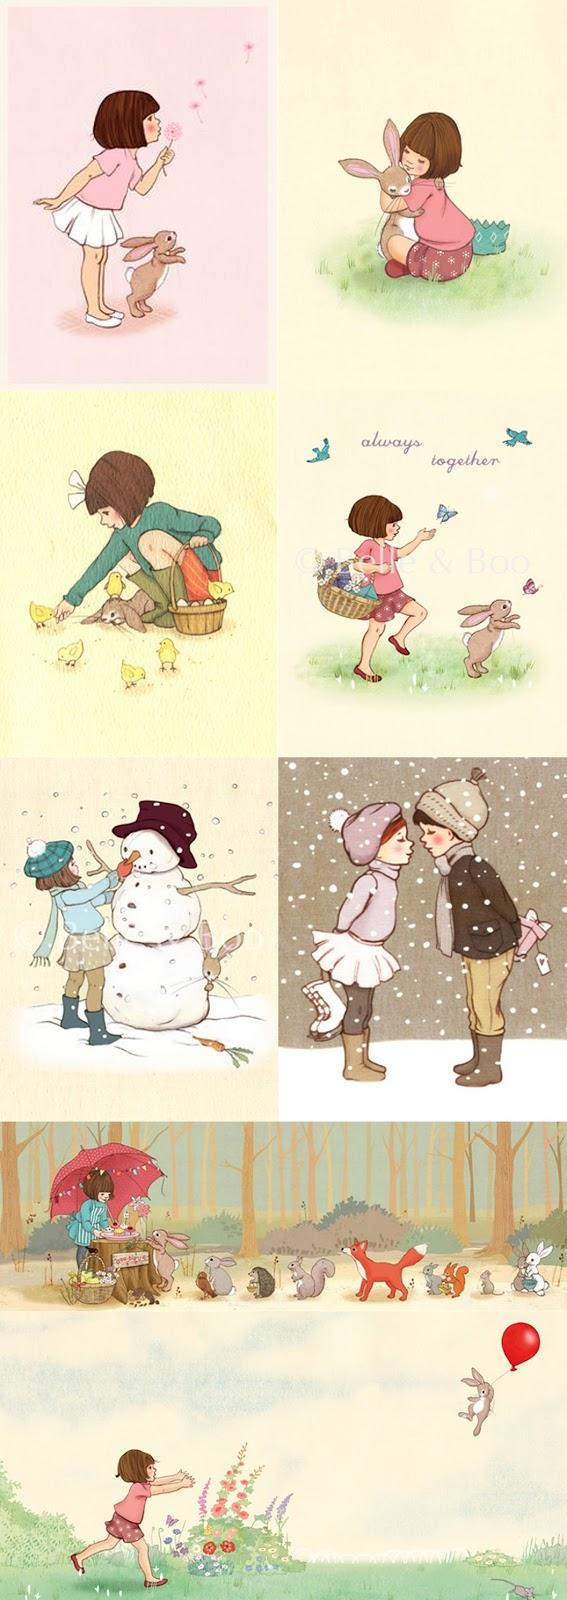 Belle e Boo ilustrações fofas